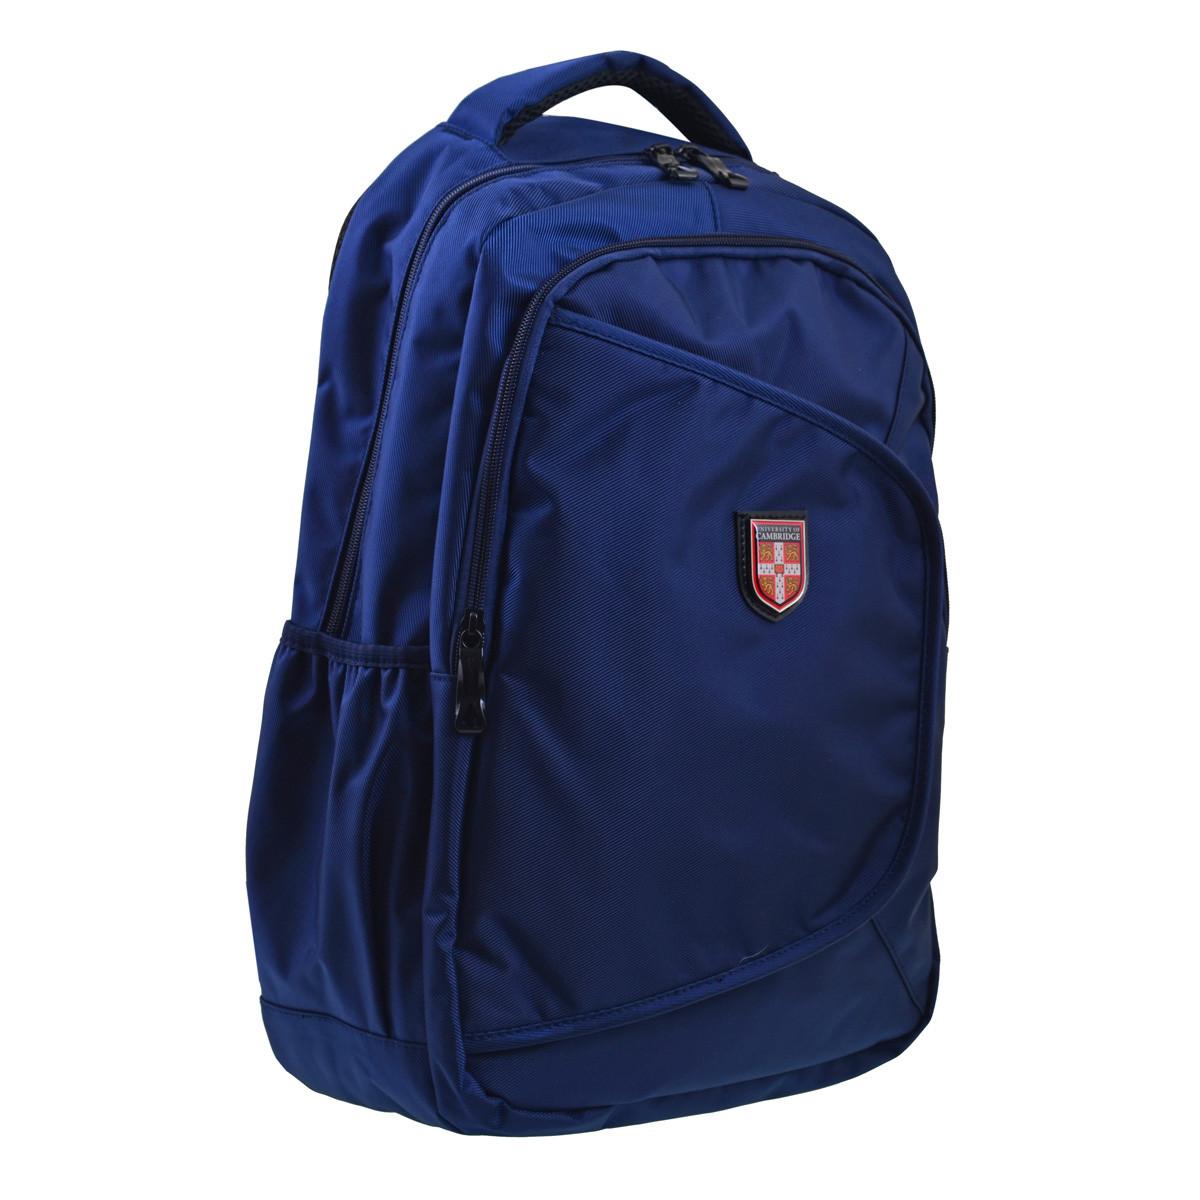 Рюкзак молодежный  CA 189,  темно-синий